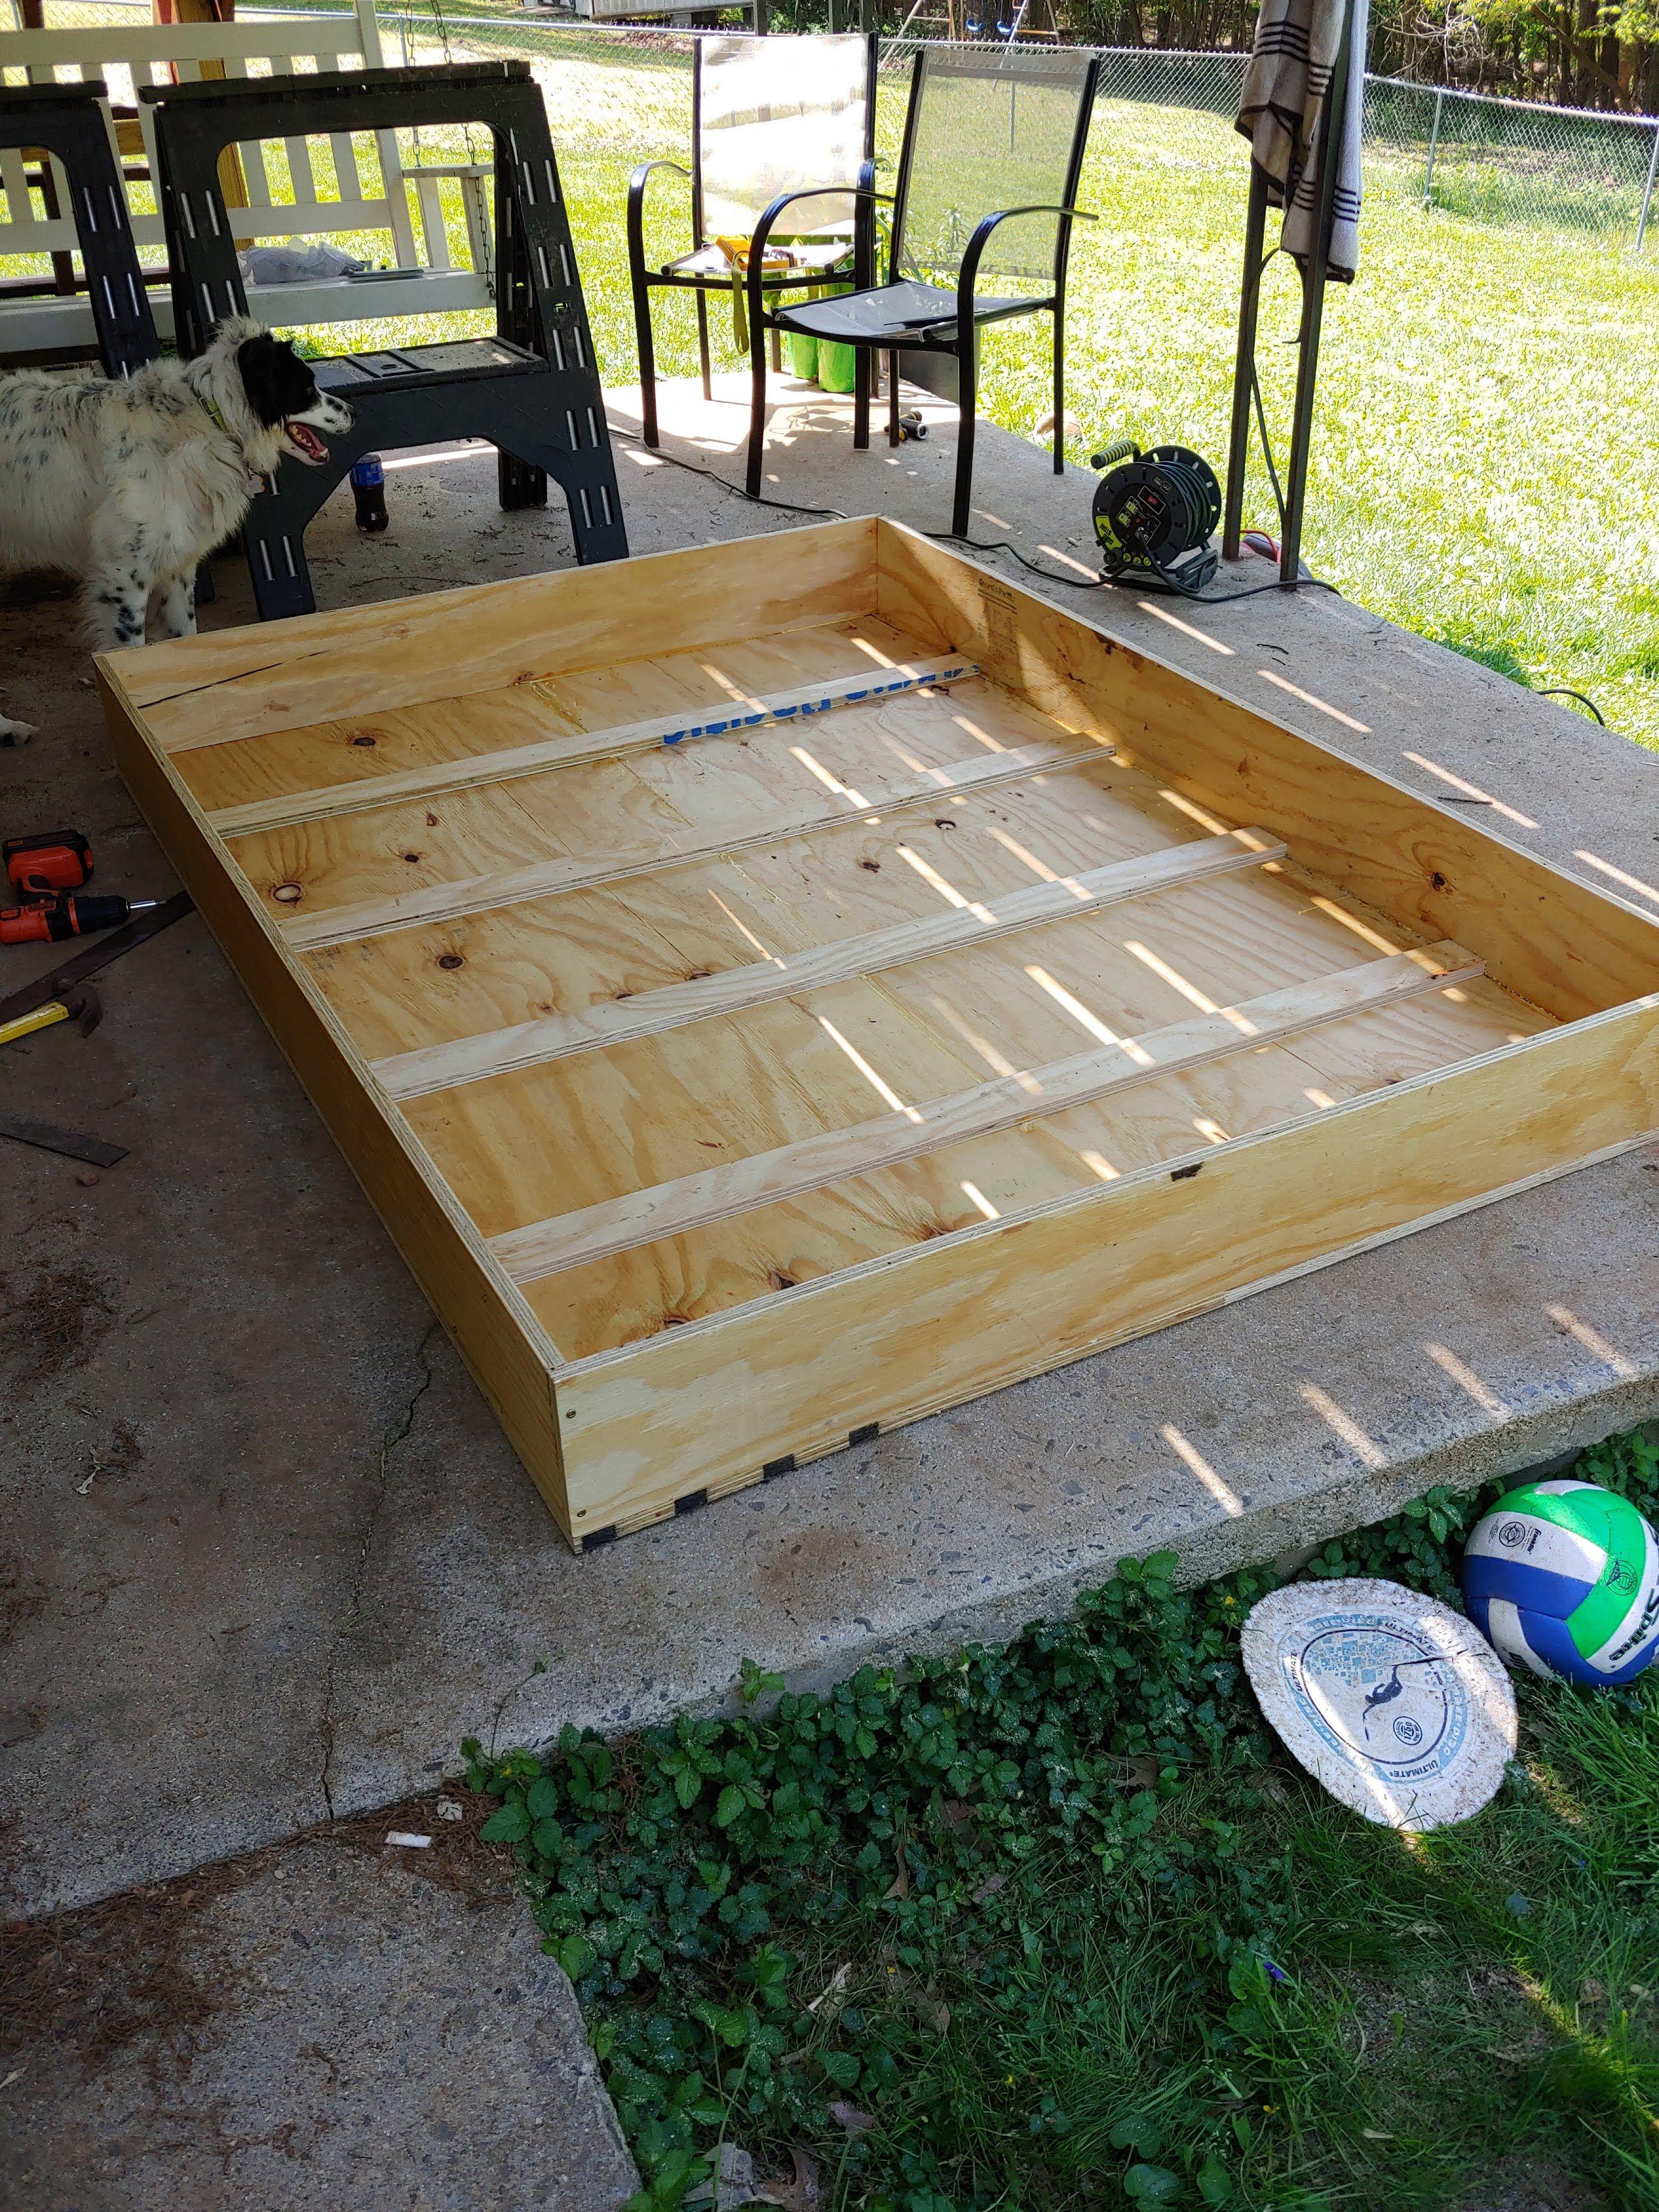 Murphy bed Ana White Murphy bed, Build a murphy bed